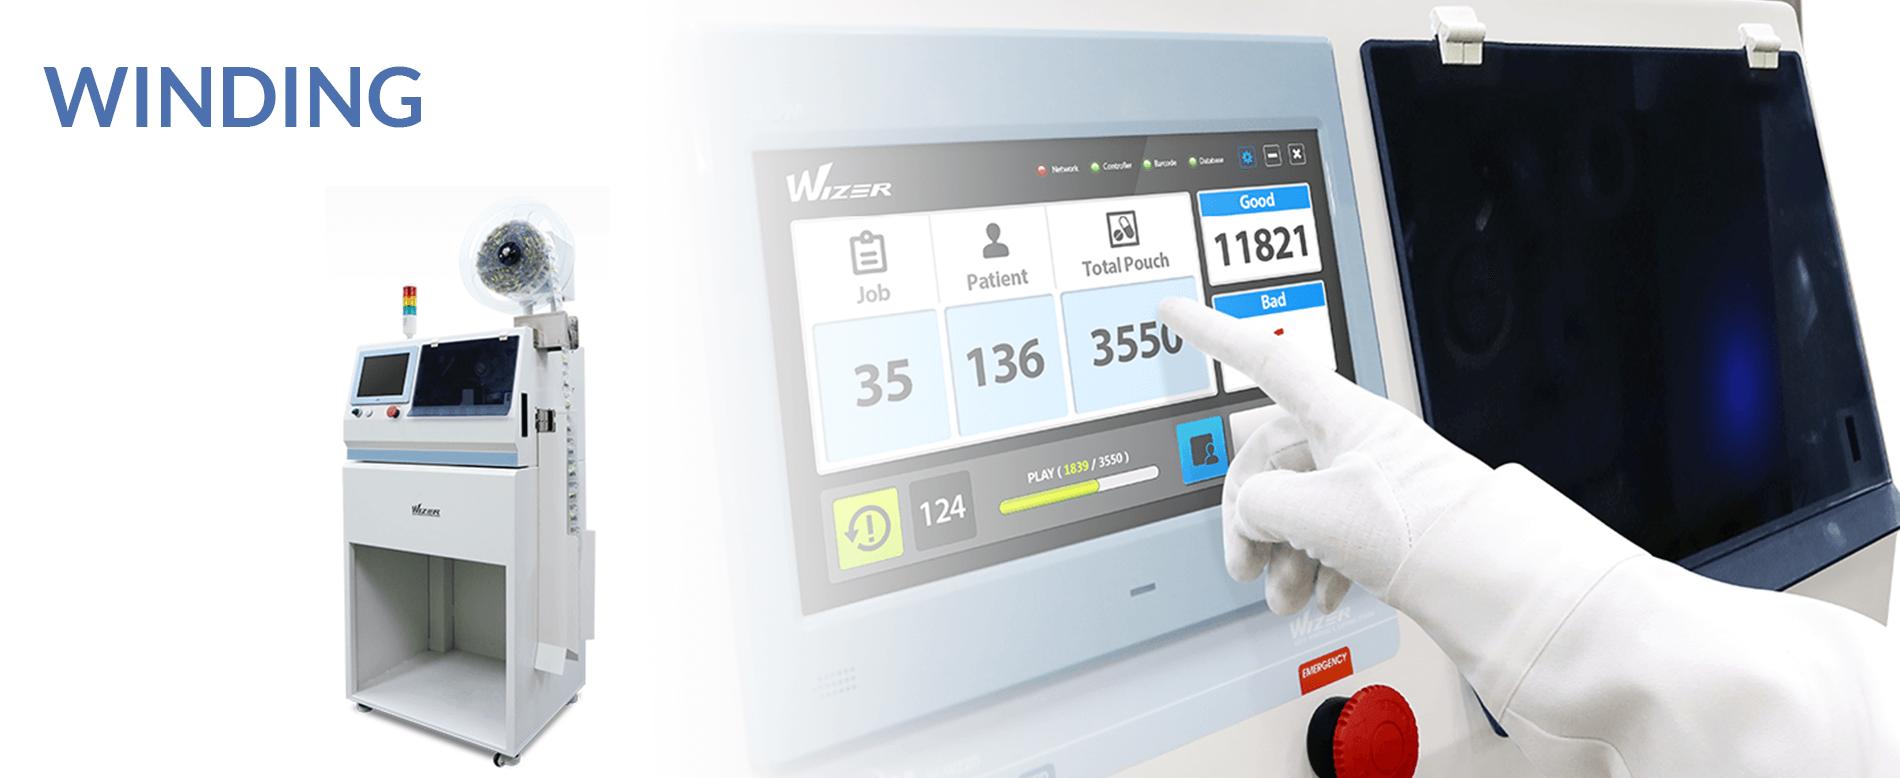 Pharmacy robotic automation